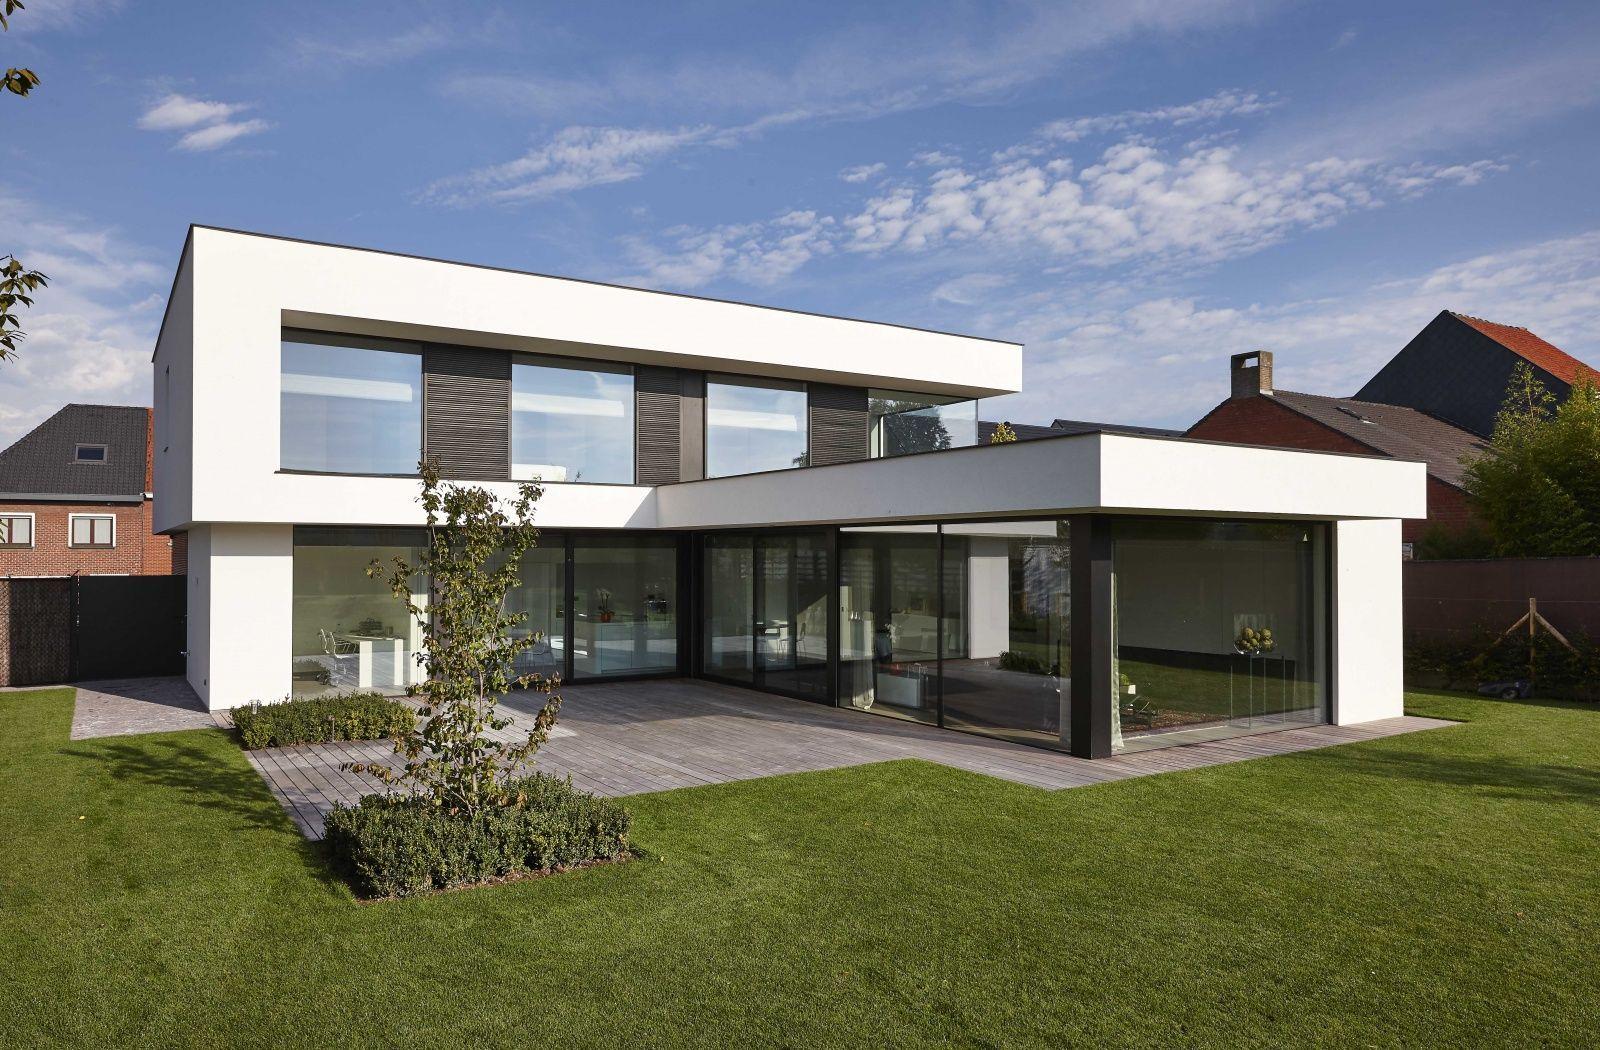 Flachdachbungalow Modern dumobil l shaped house modern architecture house